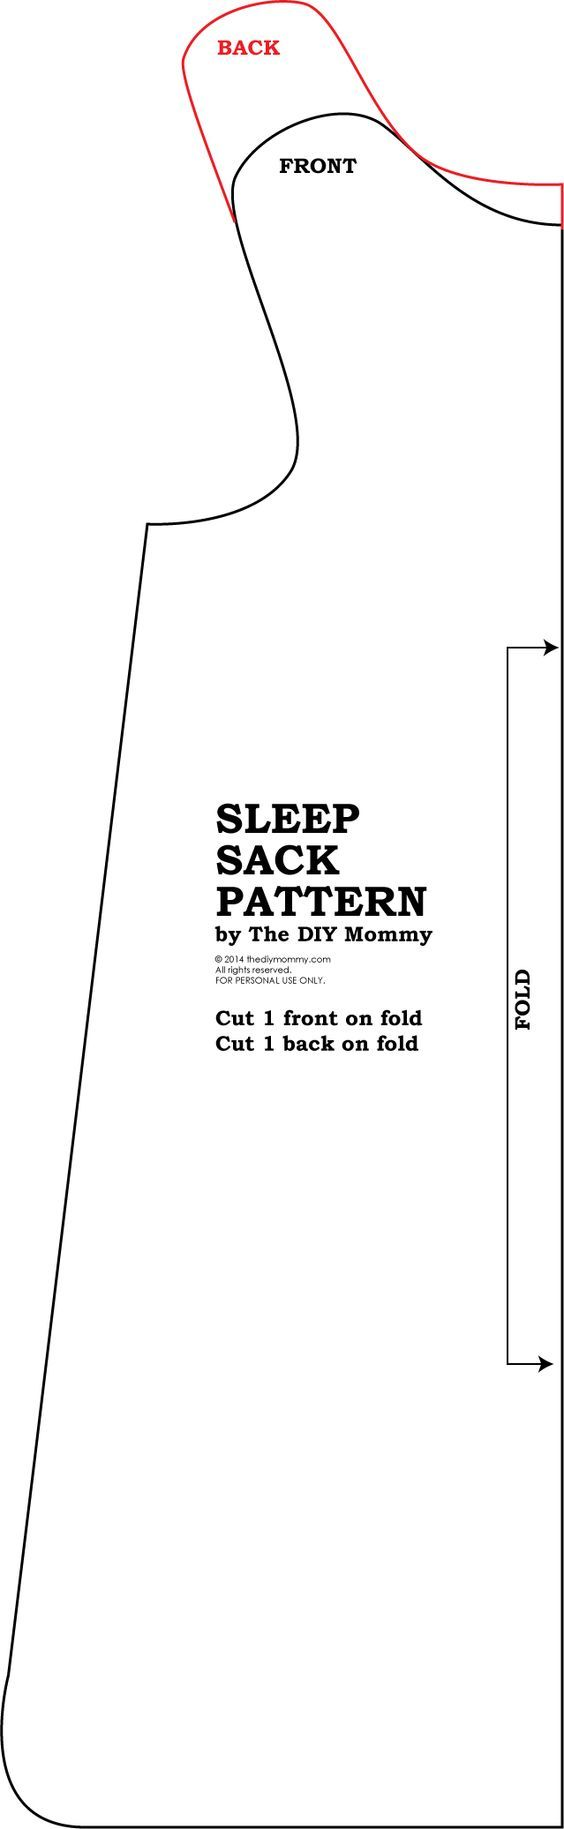 http://www.kidstoysonlineshopping.com/category/xl-sleep-sack/ http://www.infanteducationaltoys.com/category/sleep-sack/ Free Baby Sleep Sack Pattern:                                                                                                                                                      More